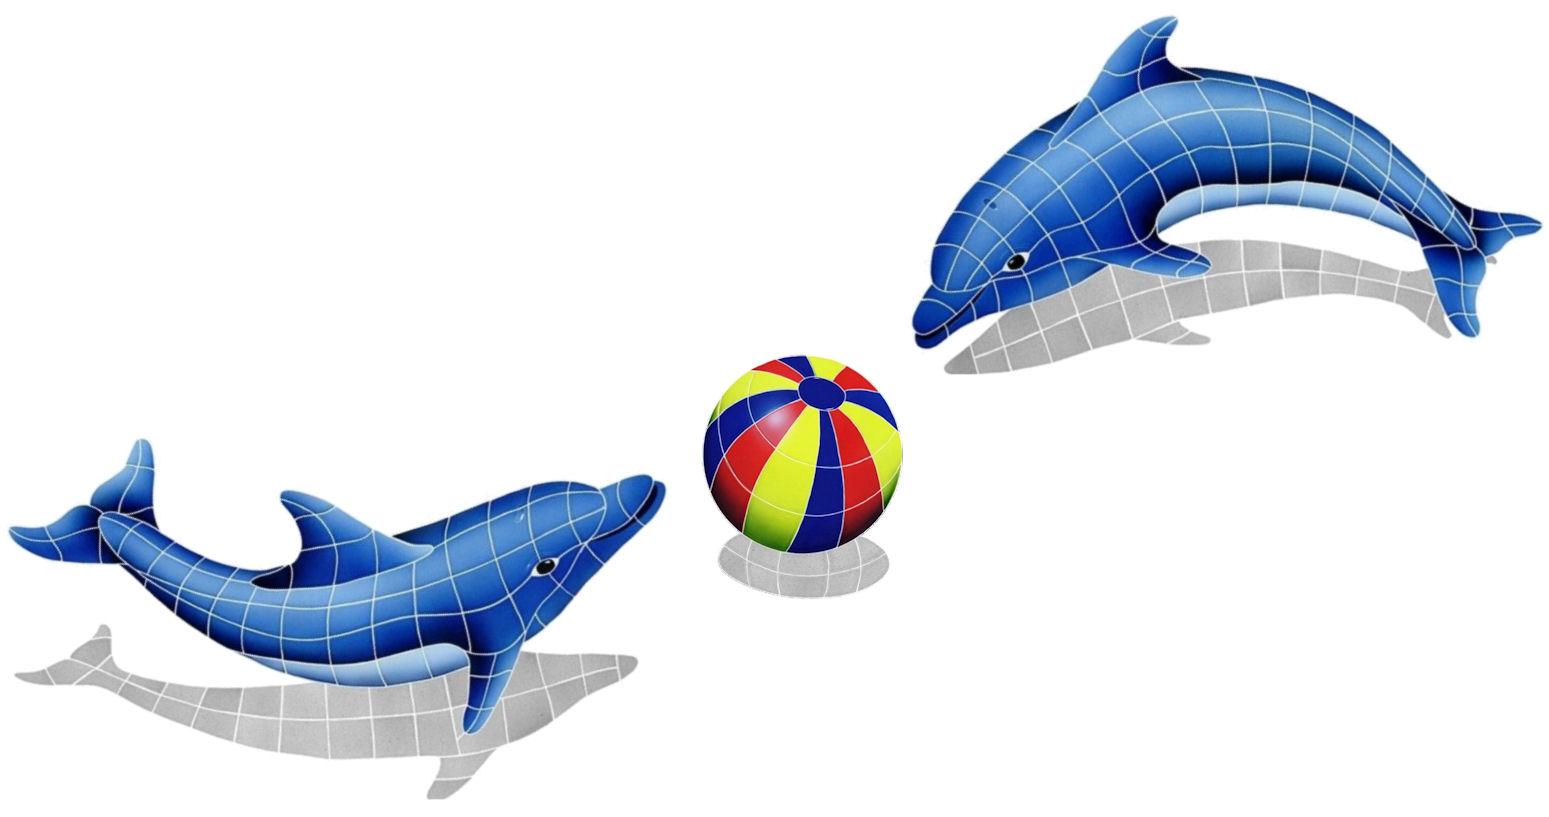 dolphin shadow trio ceramic mosaic tile